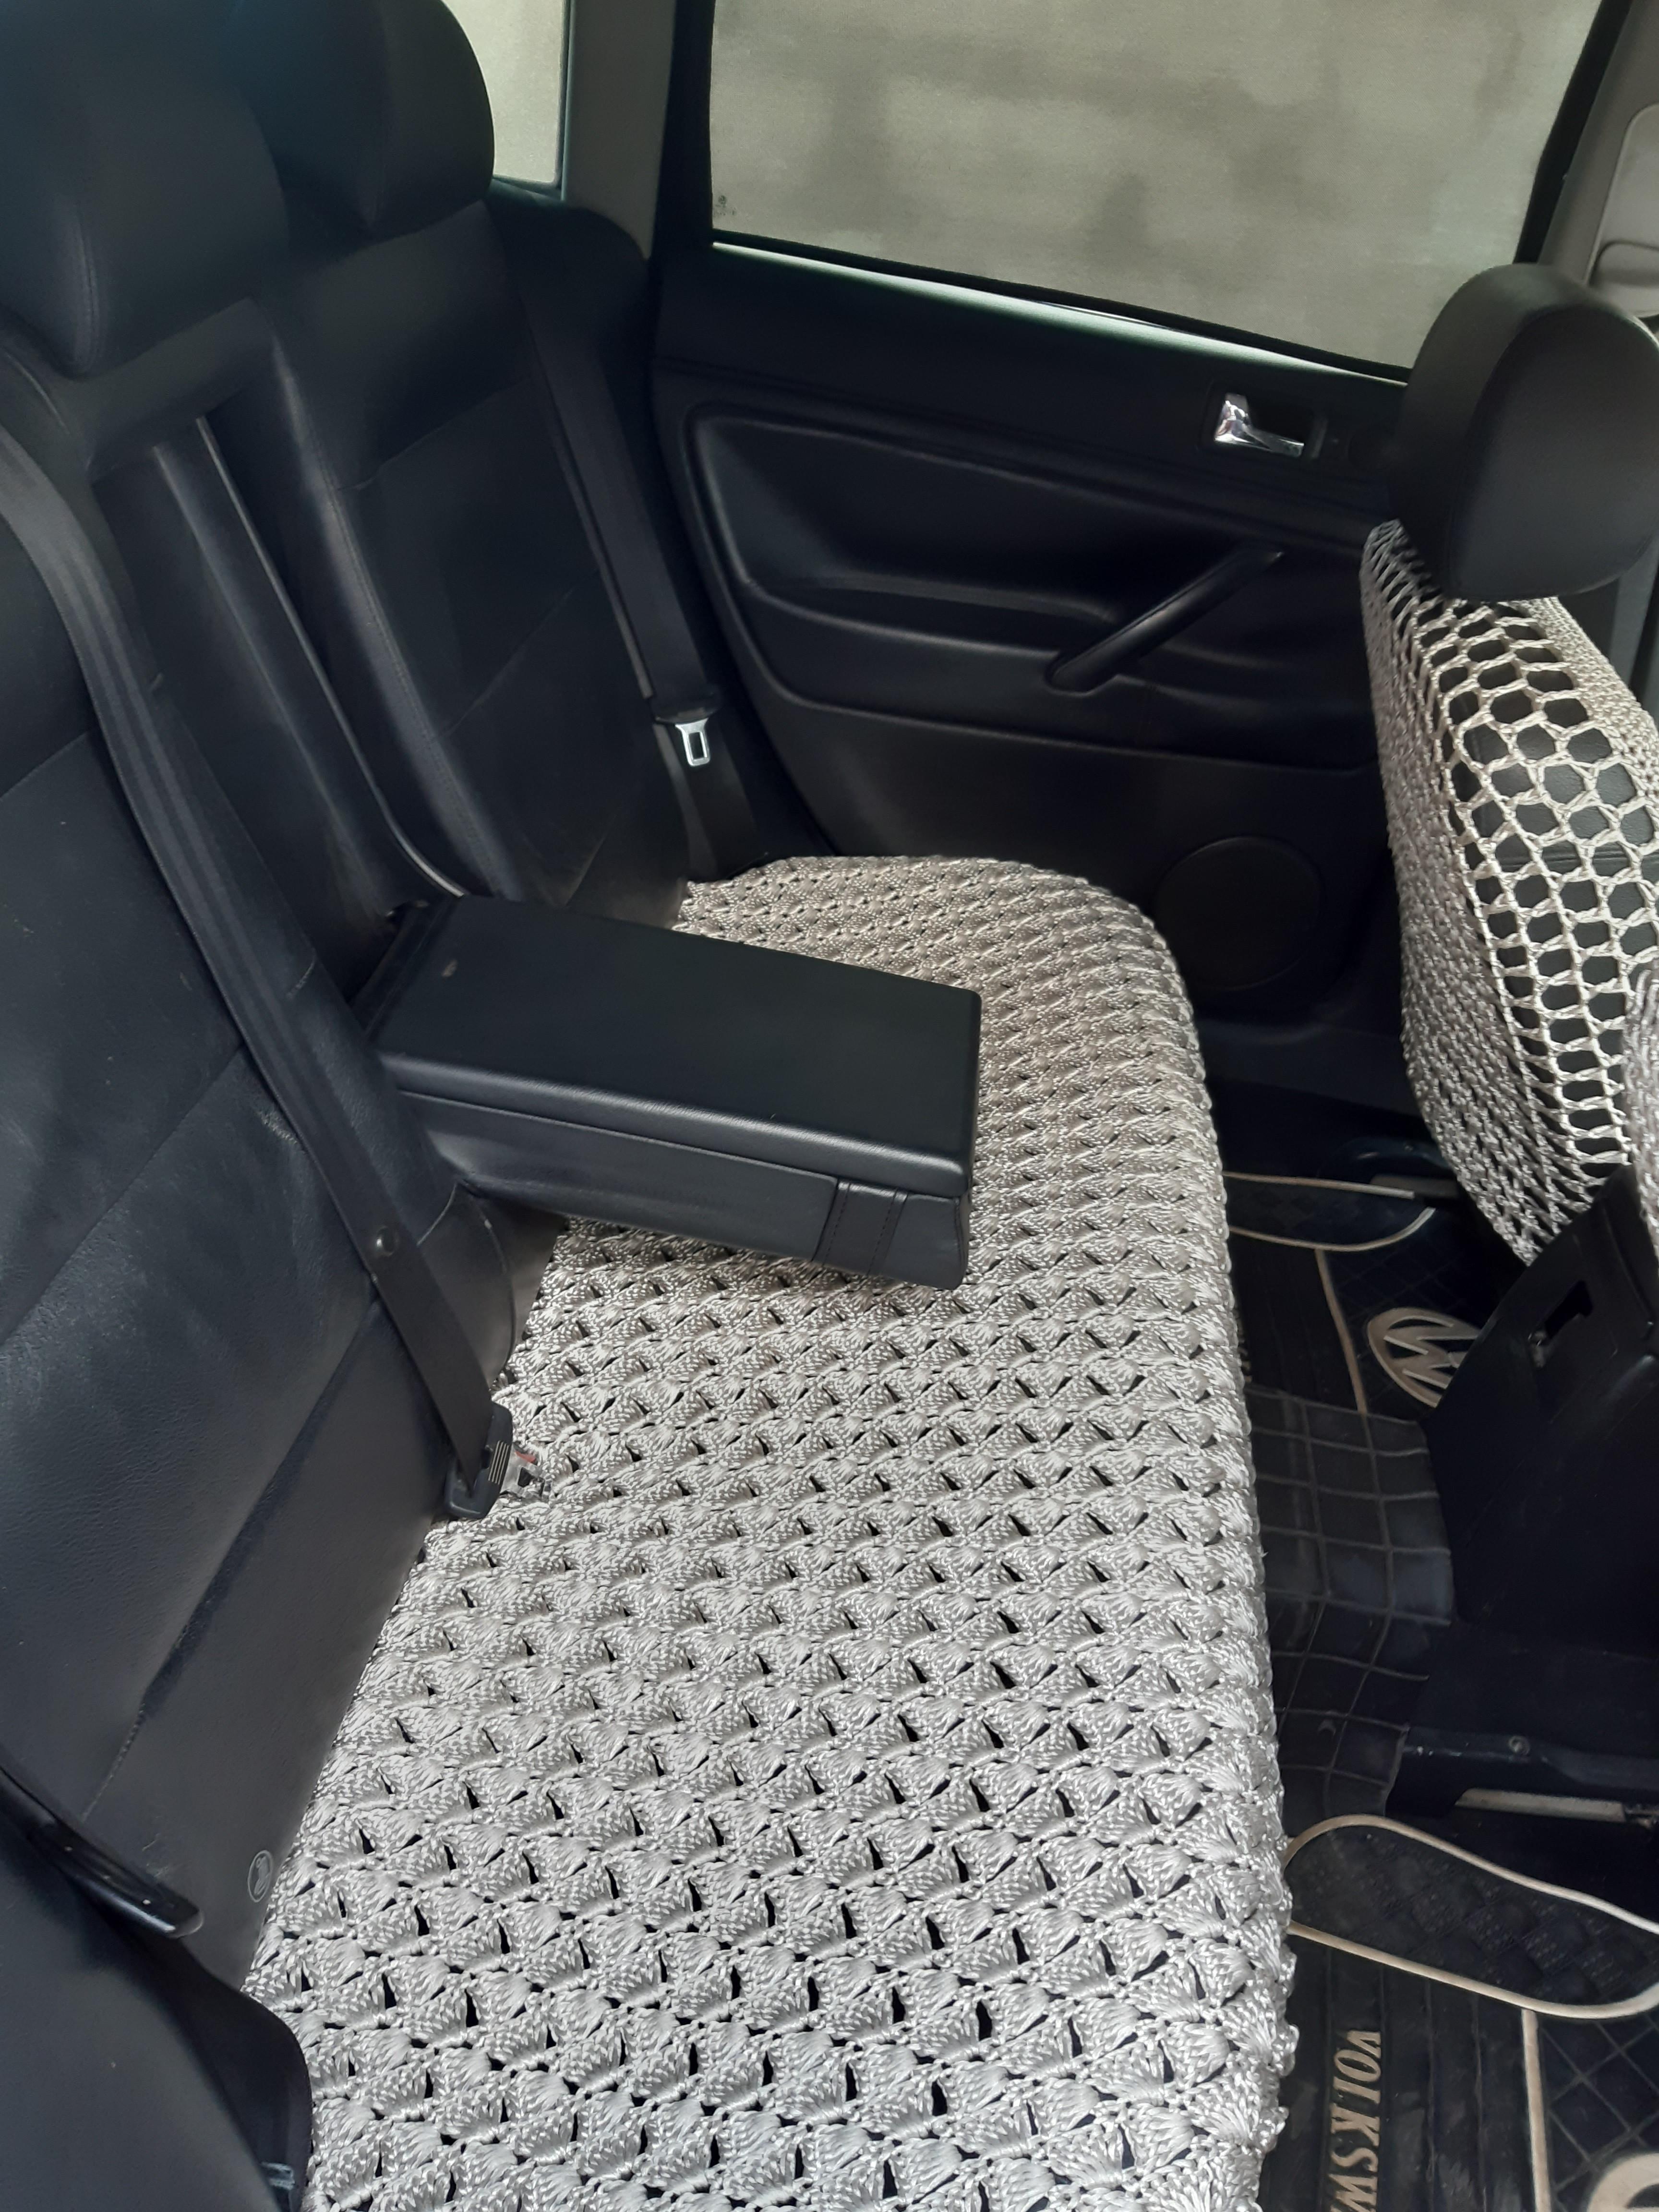 Volkswagen Passat 2.0(lt) 2003 Подержанный  $7000